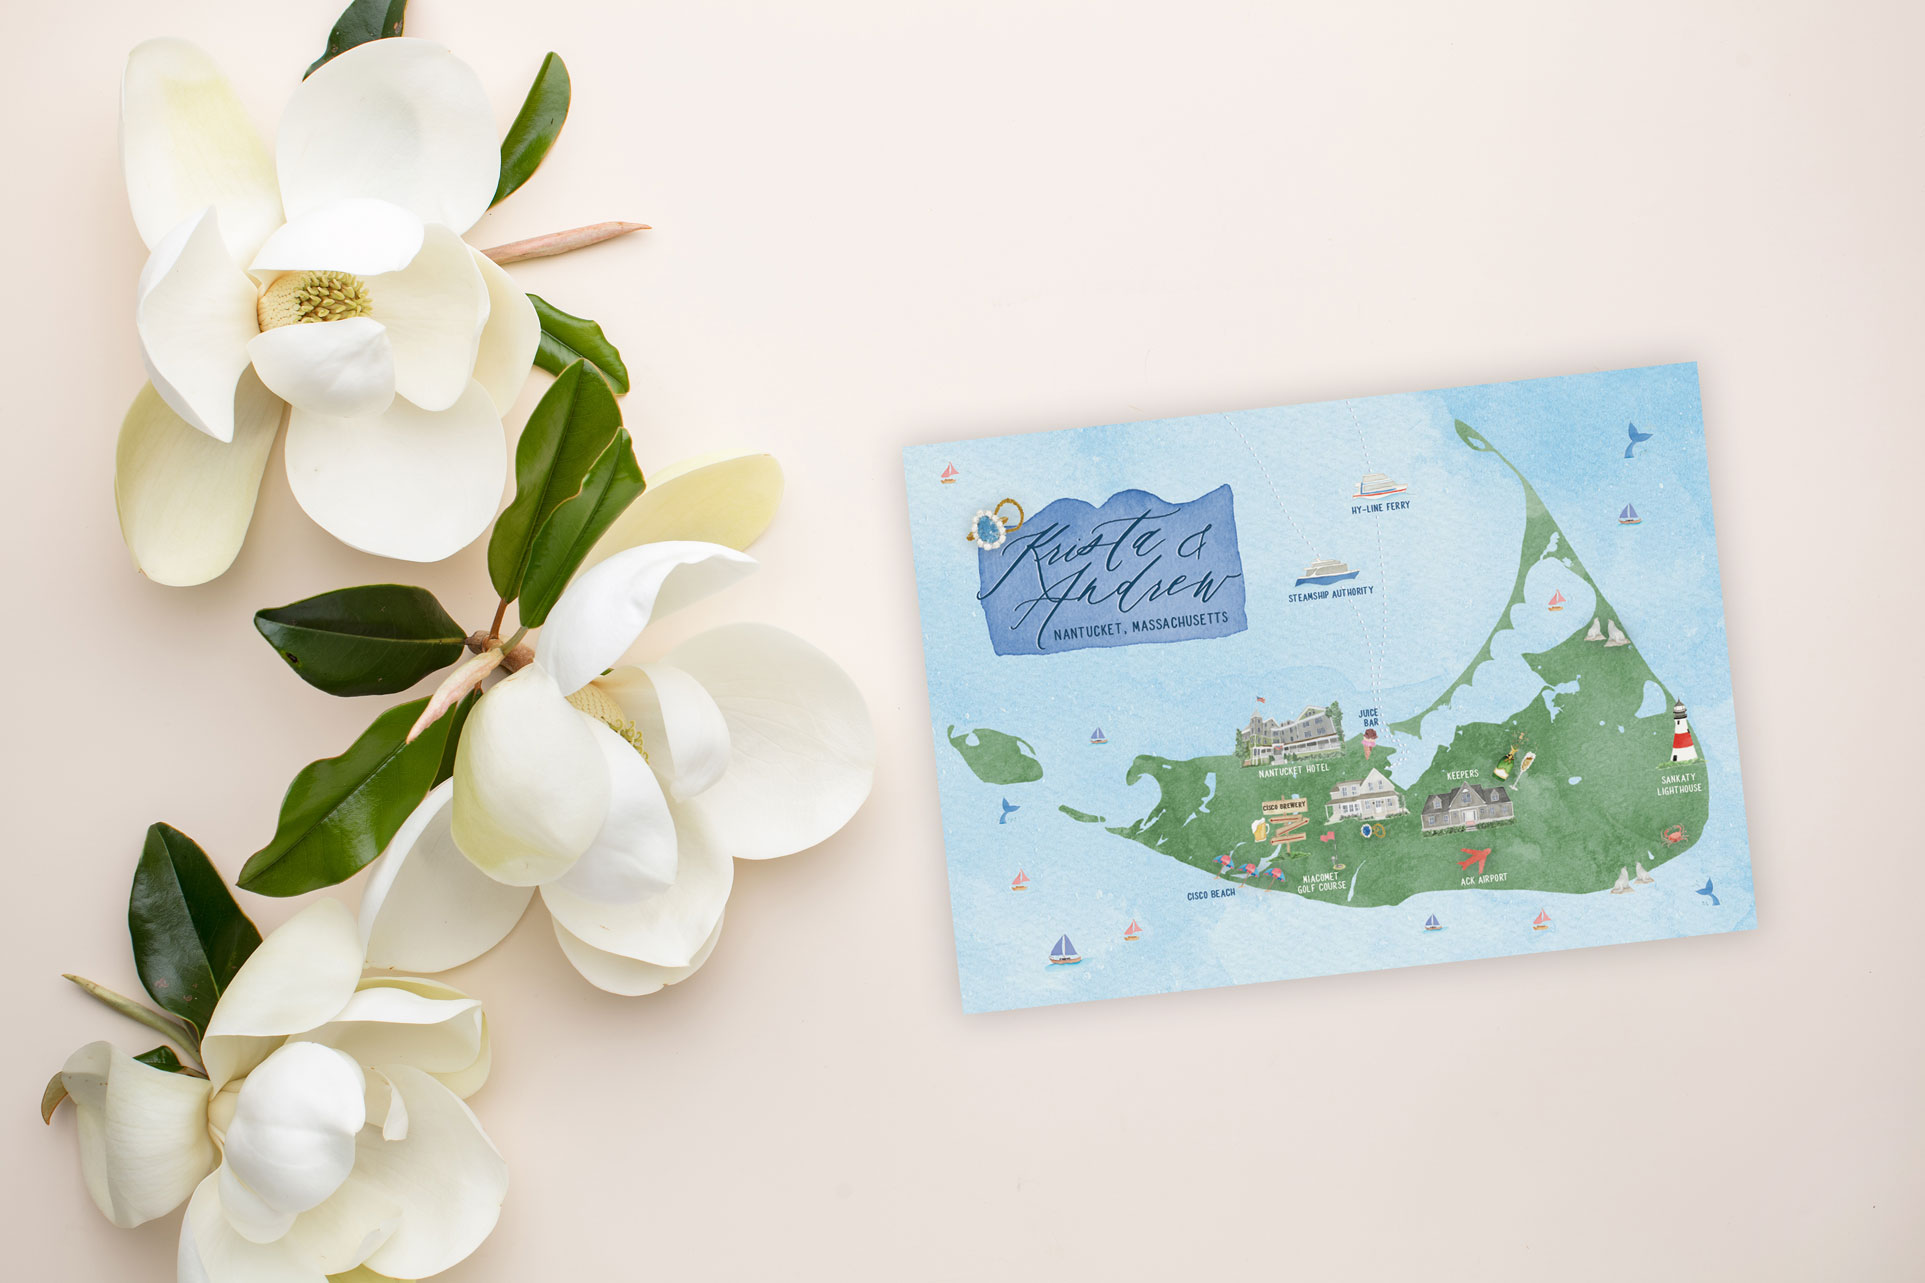 Watercolor Wedding Map - Nantucket Destination Wedding - Feathered Heart Prints